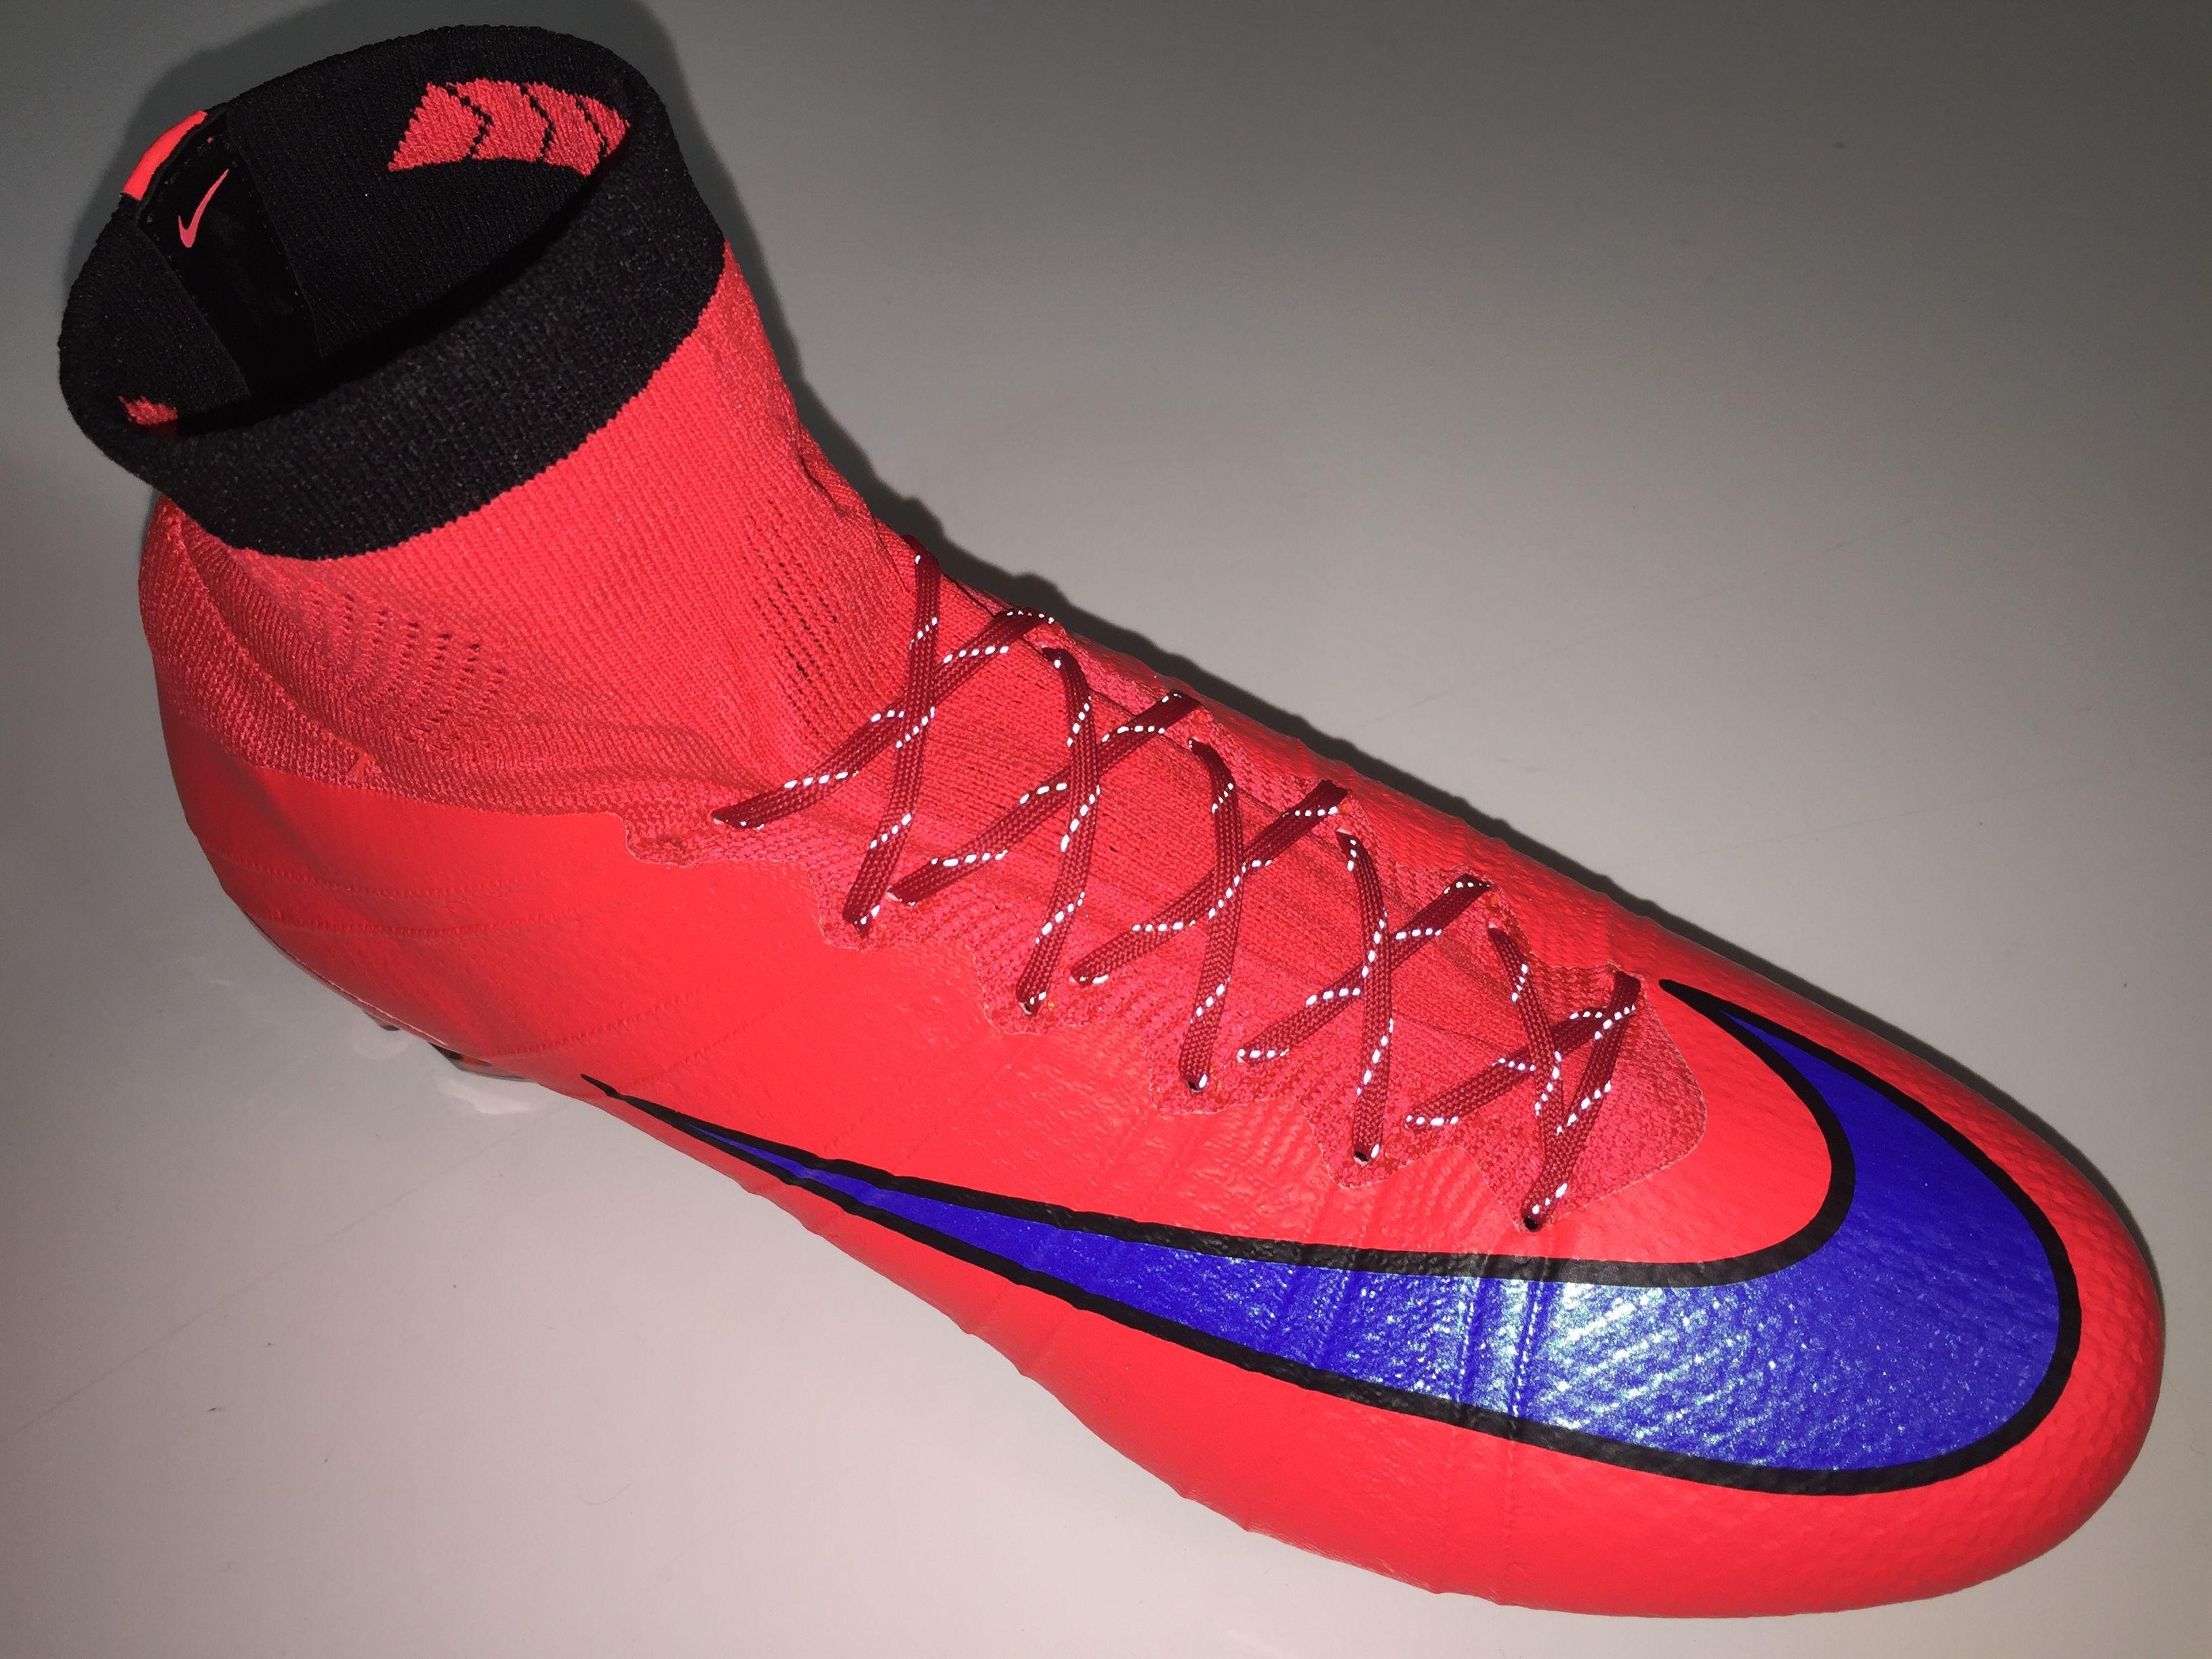 SR4U Reflective Laces Red | Soccer